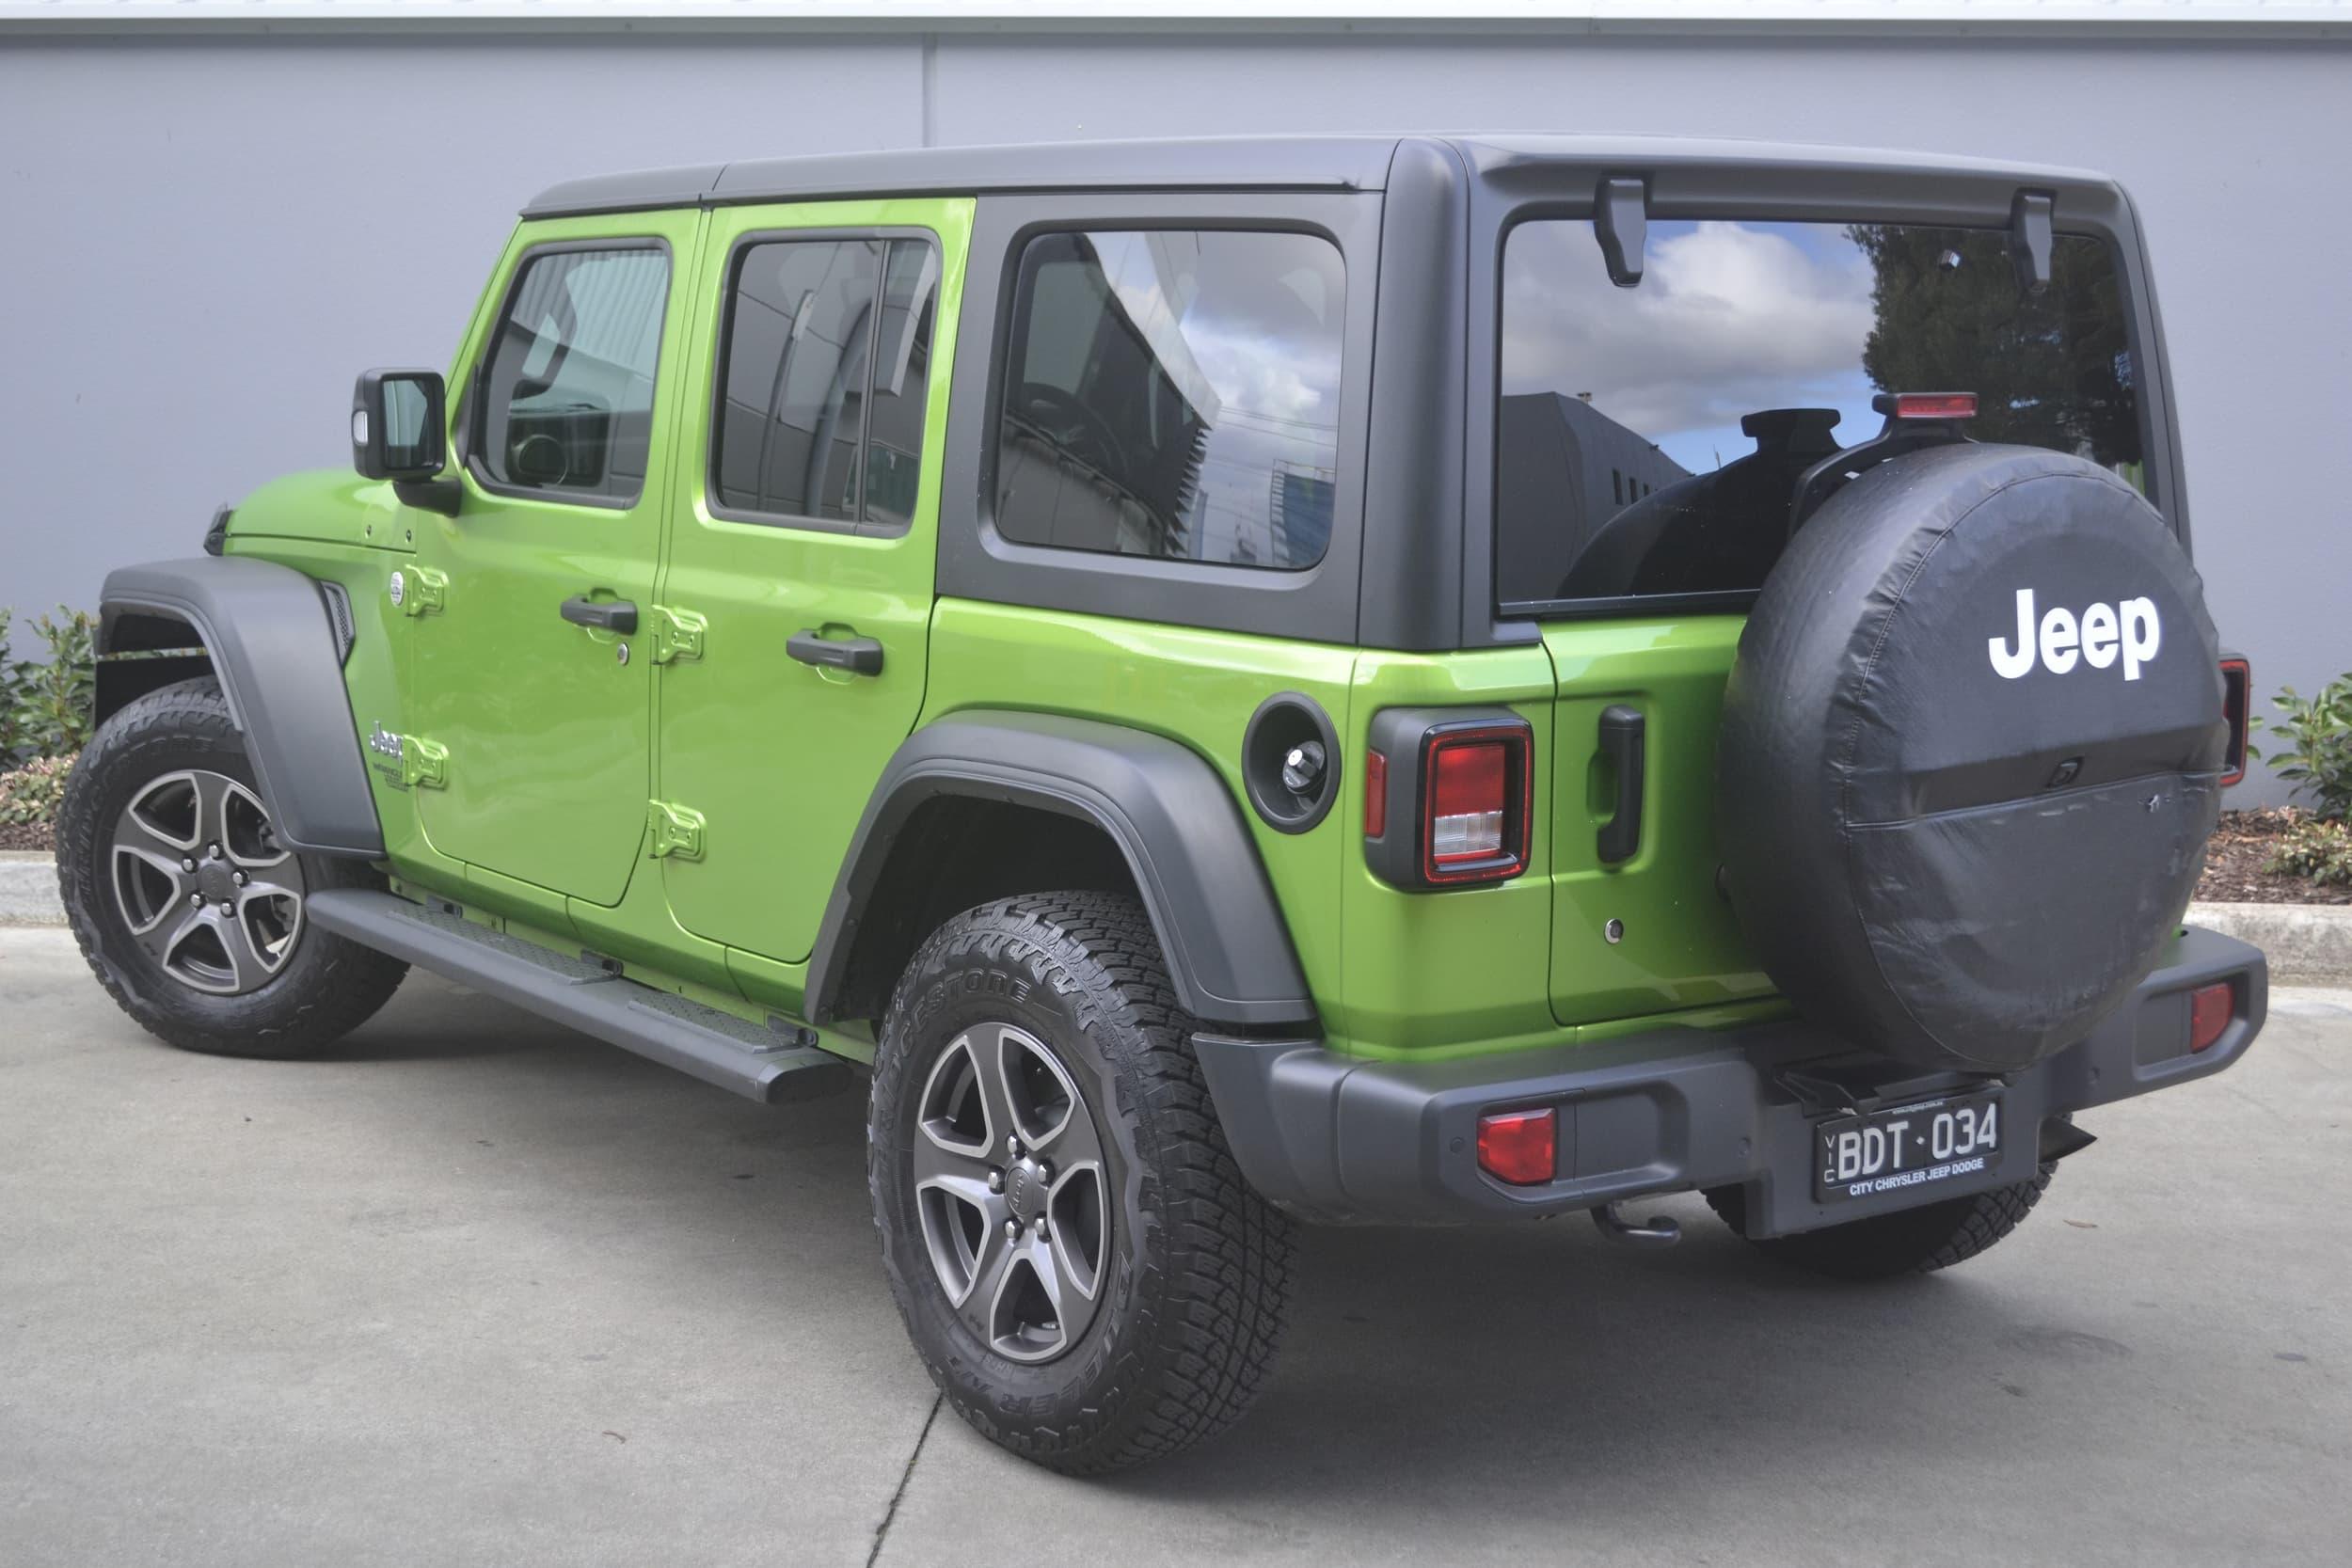 2019 Jeep Wrangler Unlimited Sport S Auto 4x4 MY19 - image 29